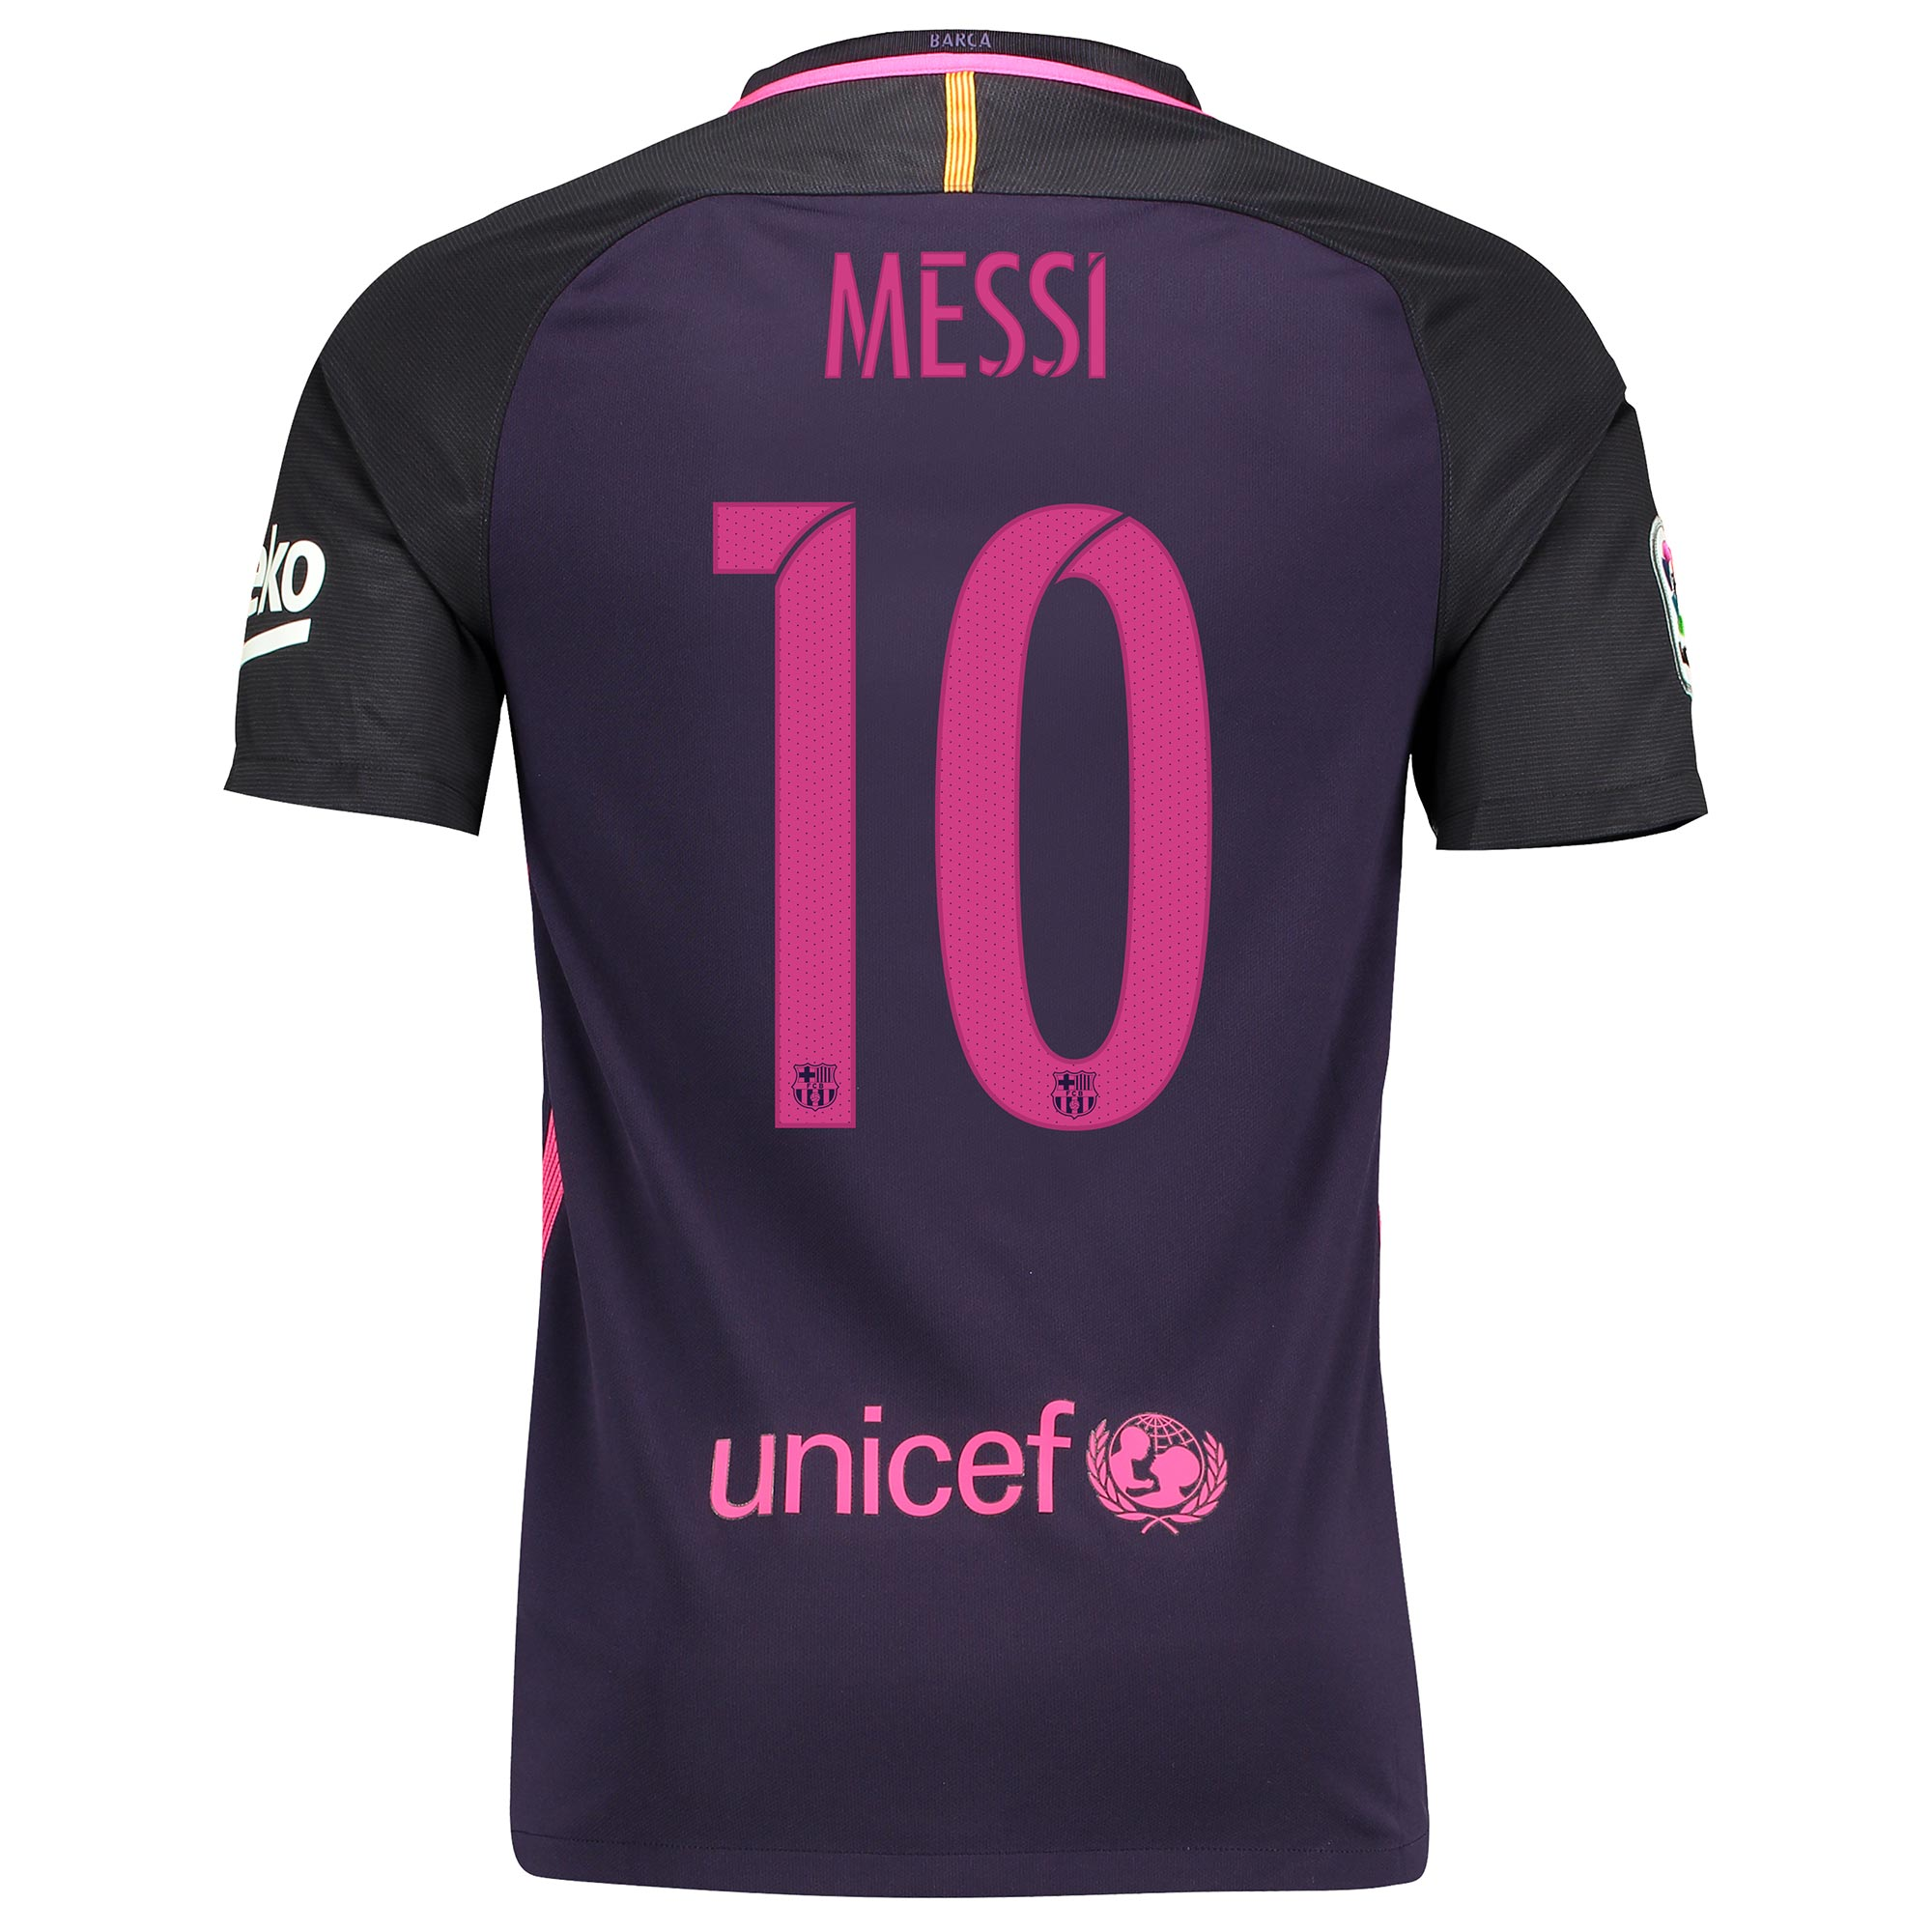 Barcelona Away Shirt 2016-17 - Kids - Sponsored with Messi 10 printing, Purple